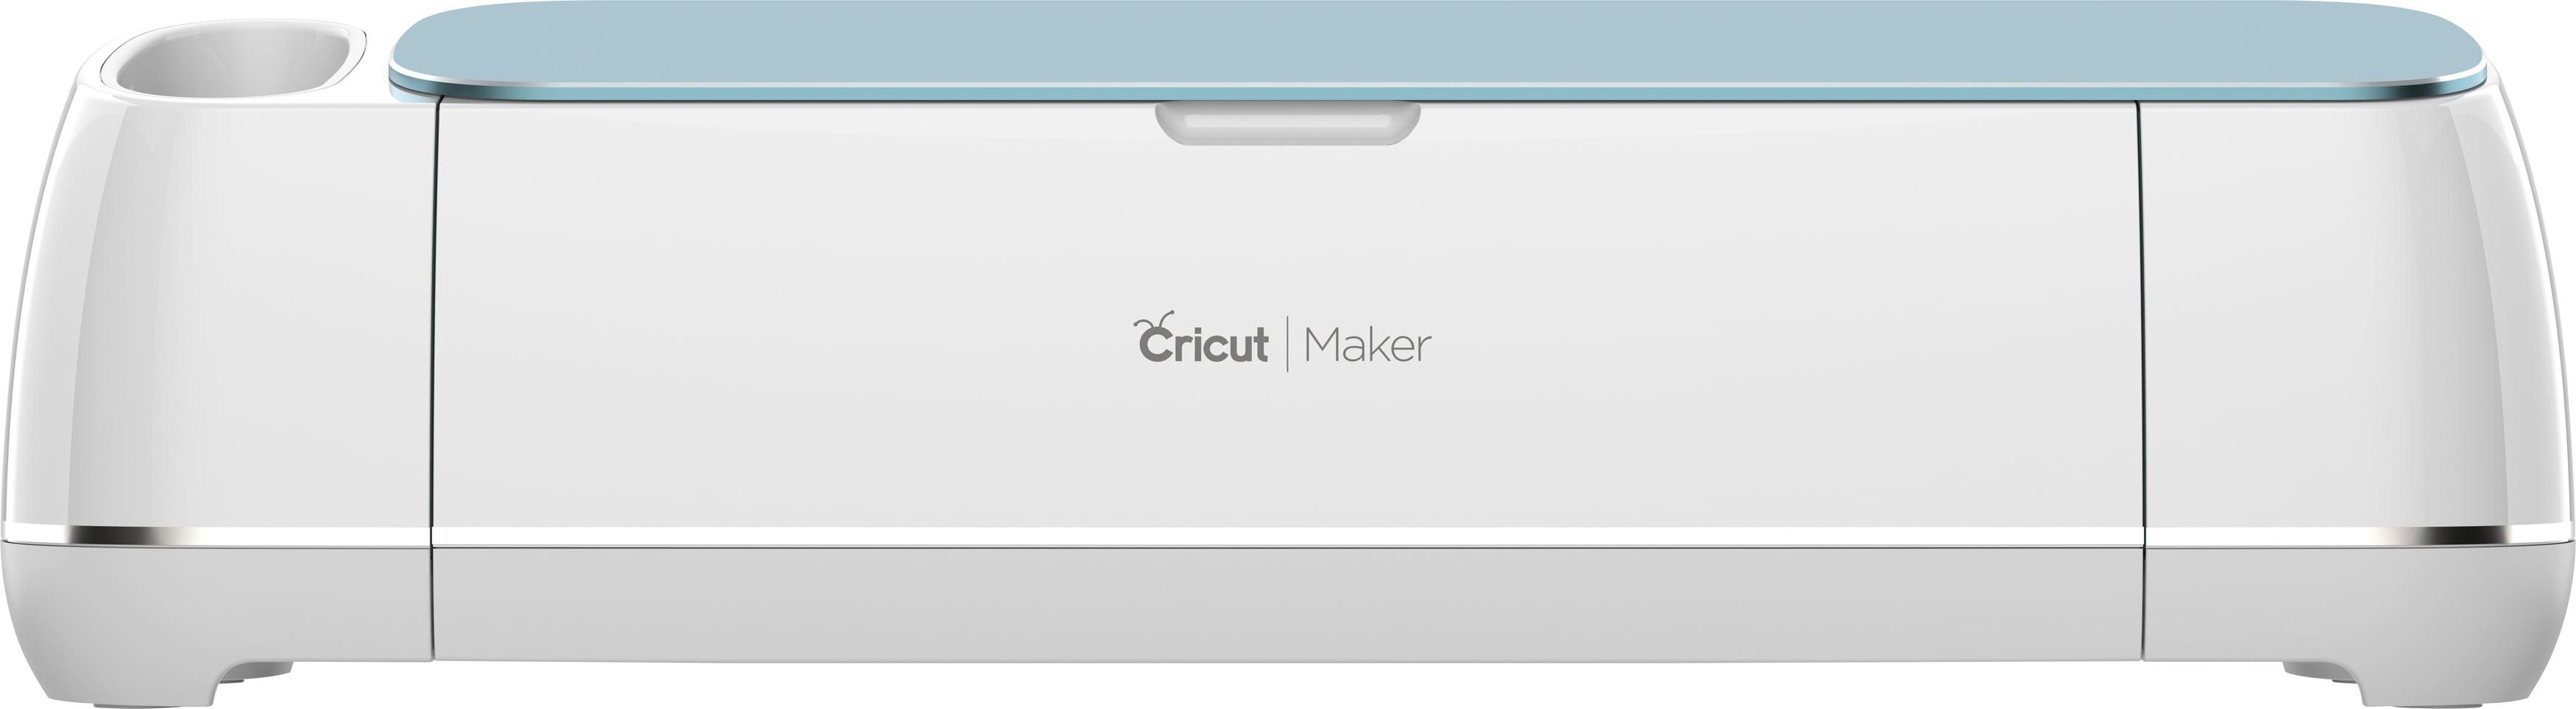 Cricut Maker Blue